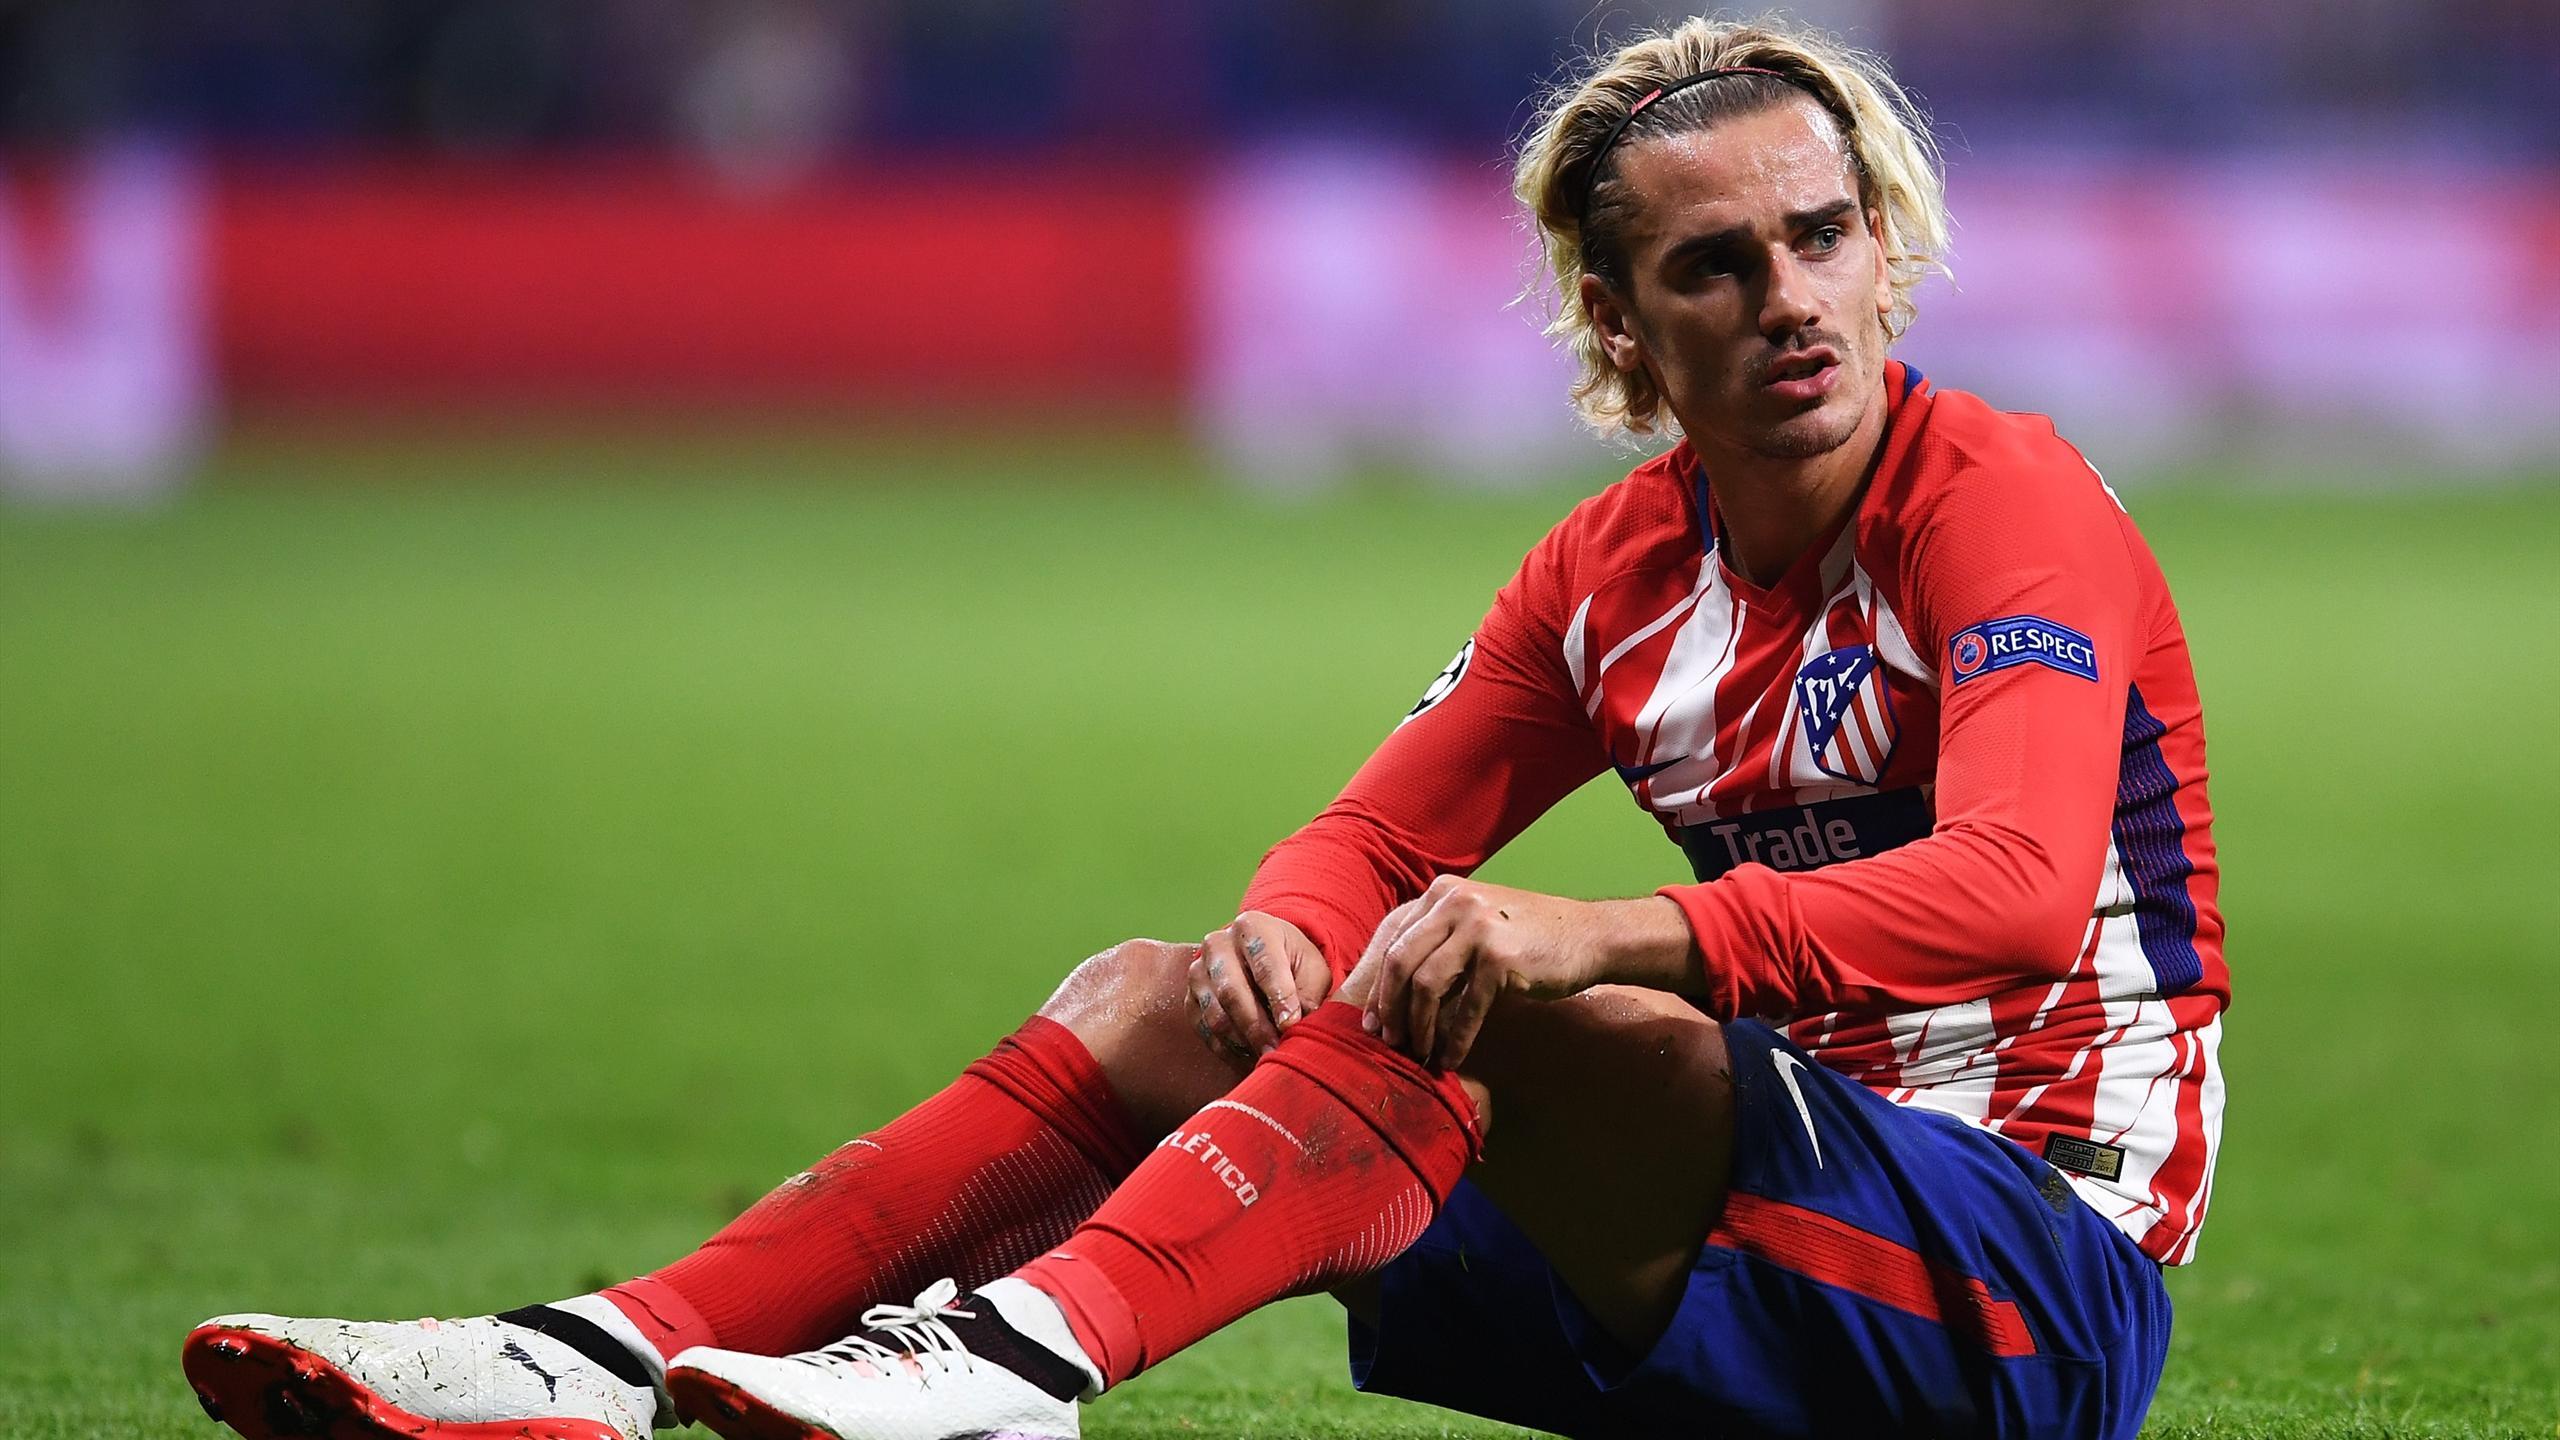 Antoine Griezmann Player Profile Football Eurosport